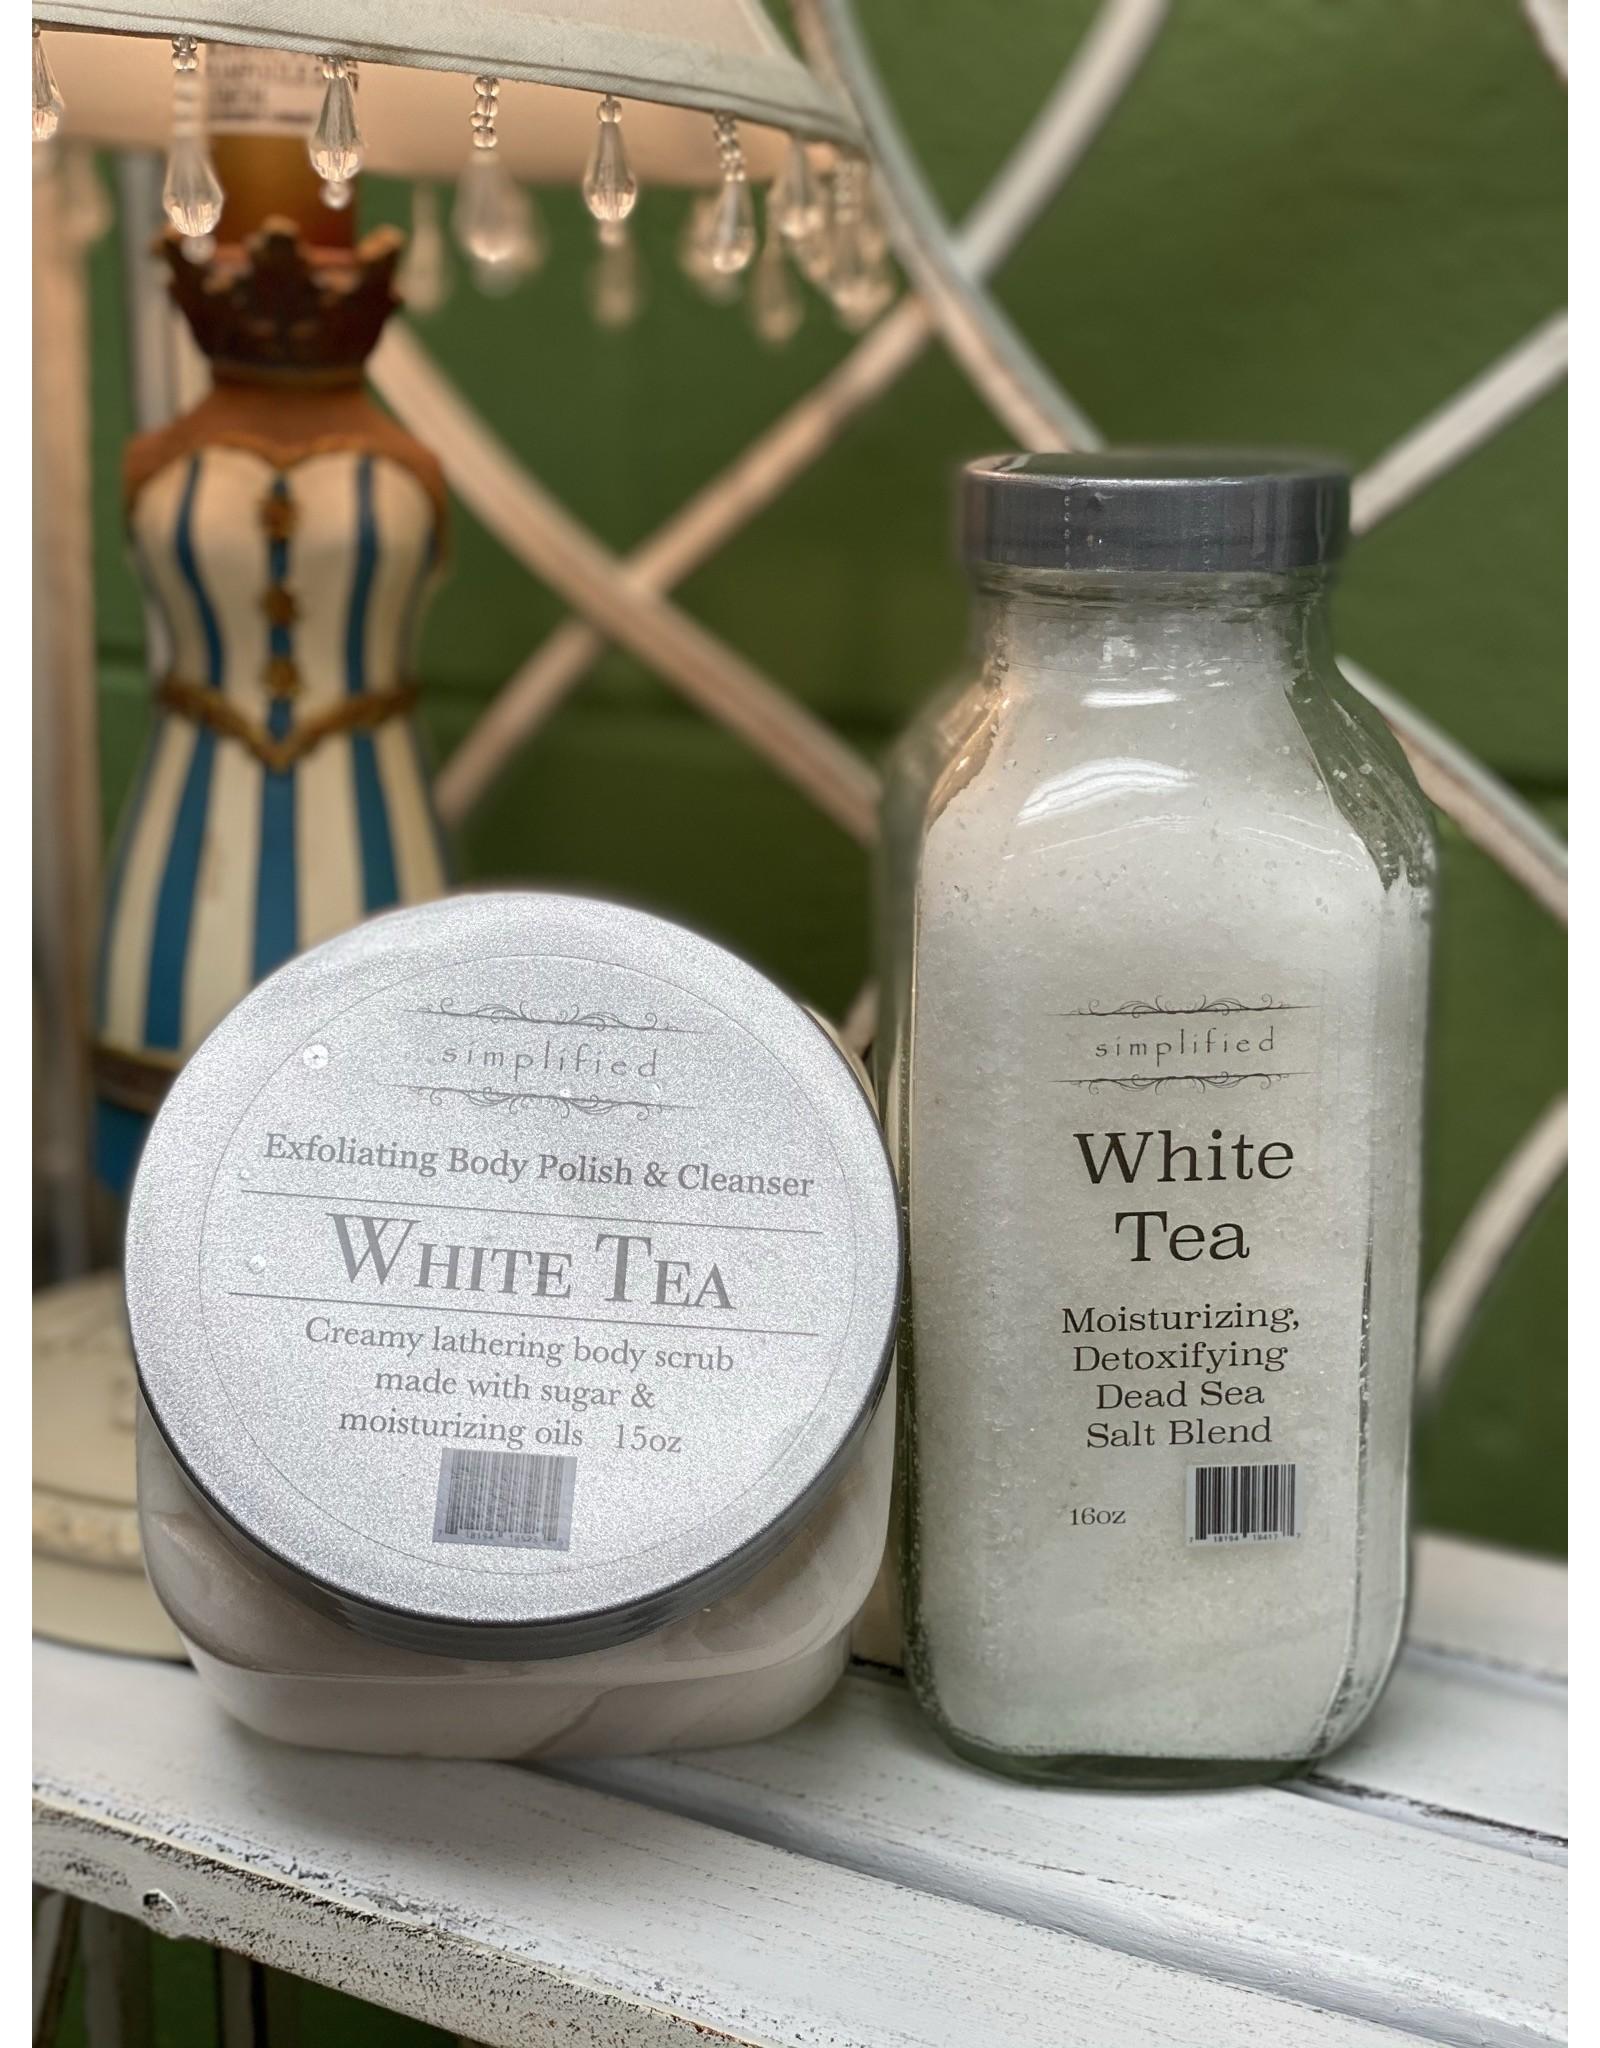 White Tea Body Polish & Cleanser